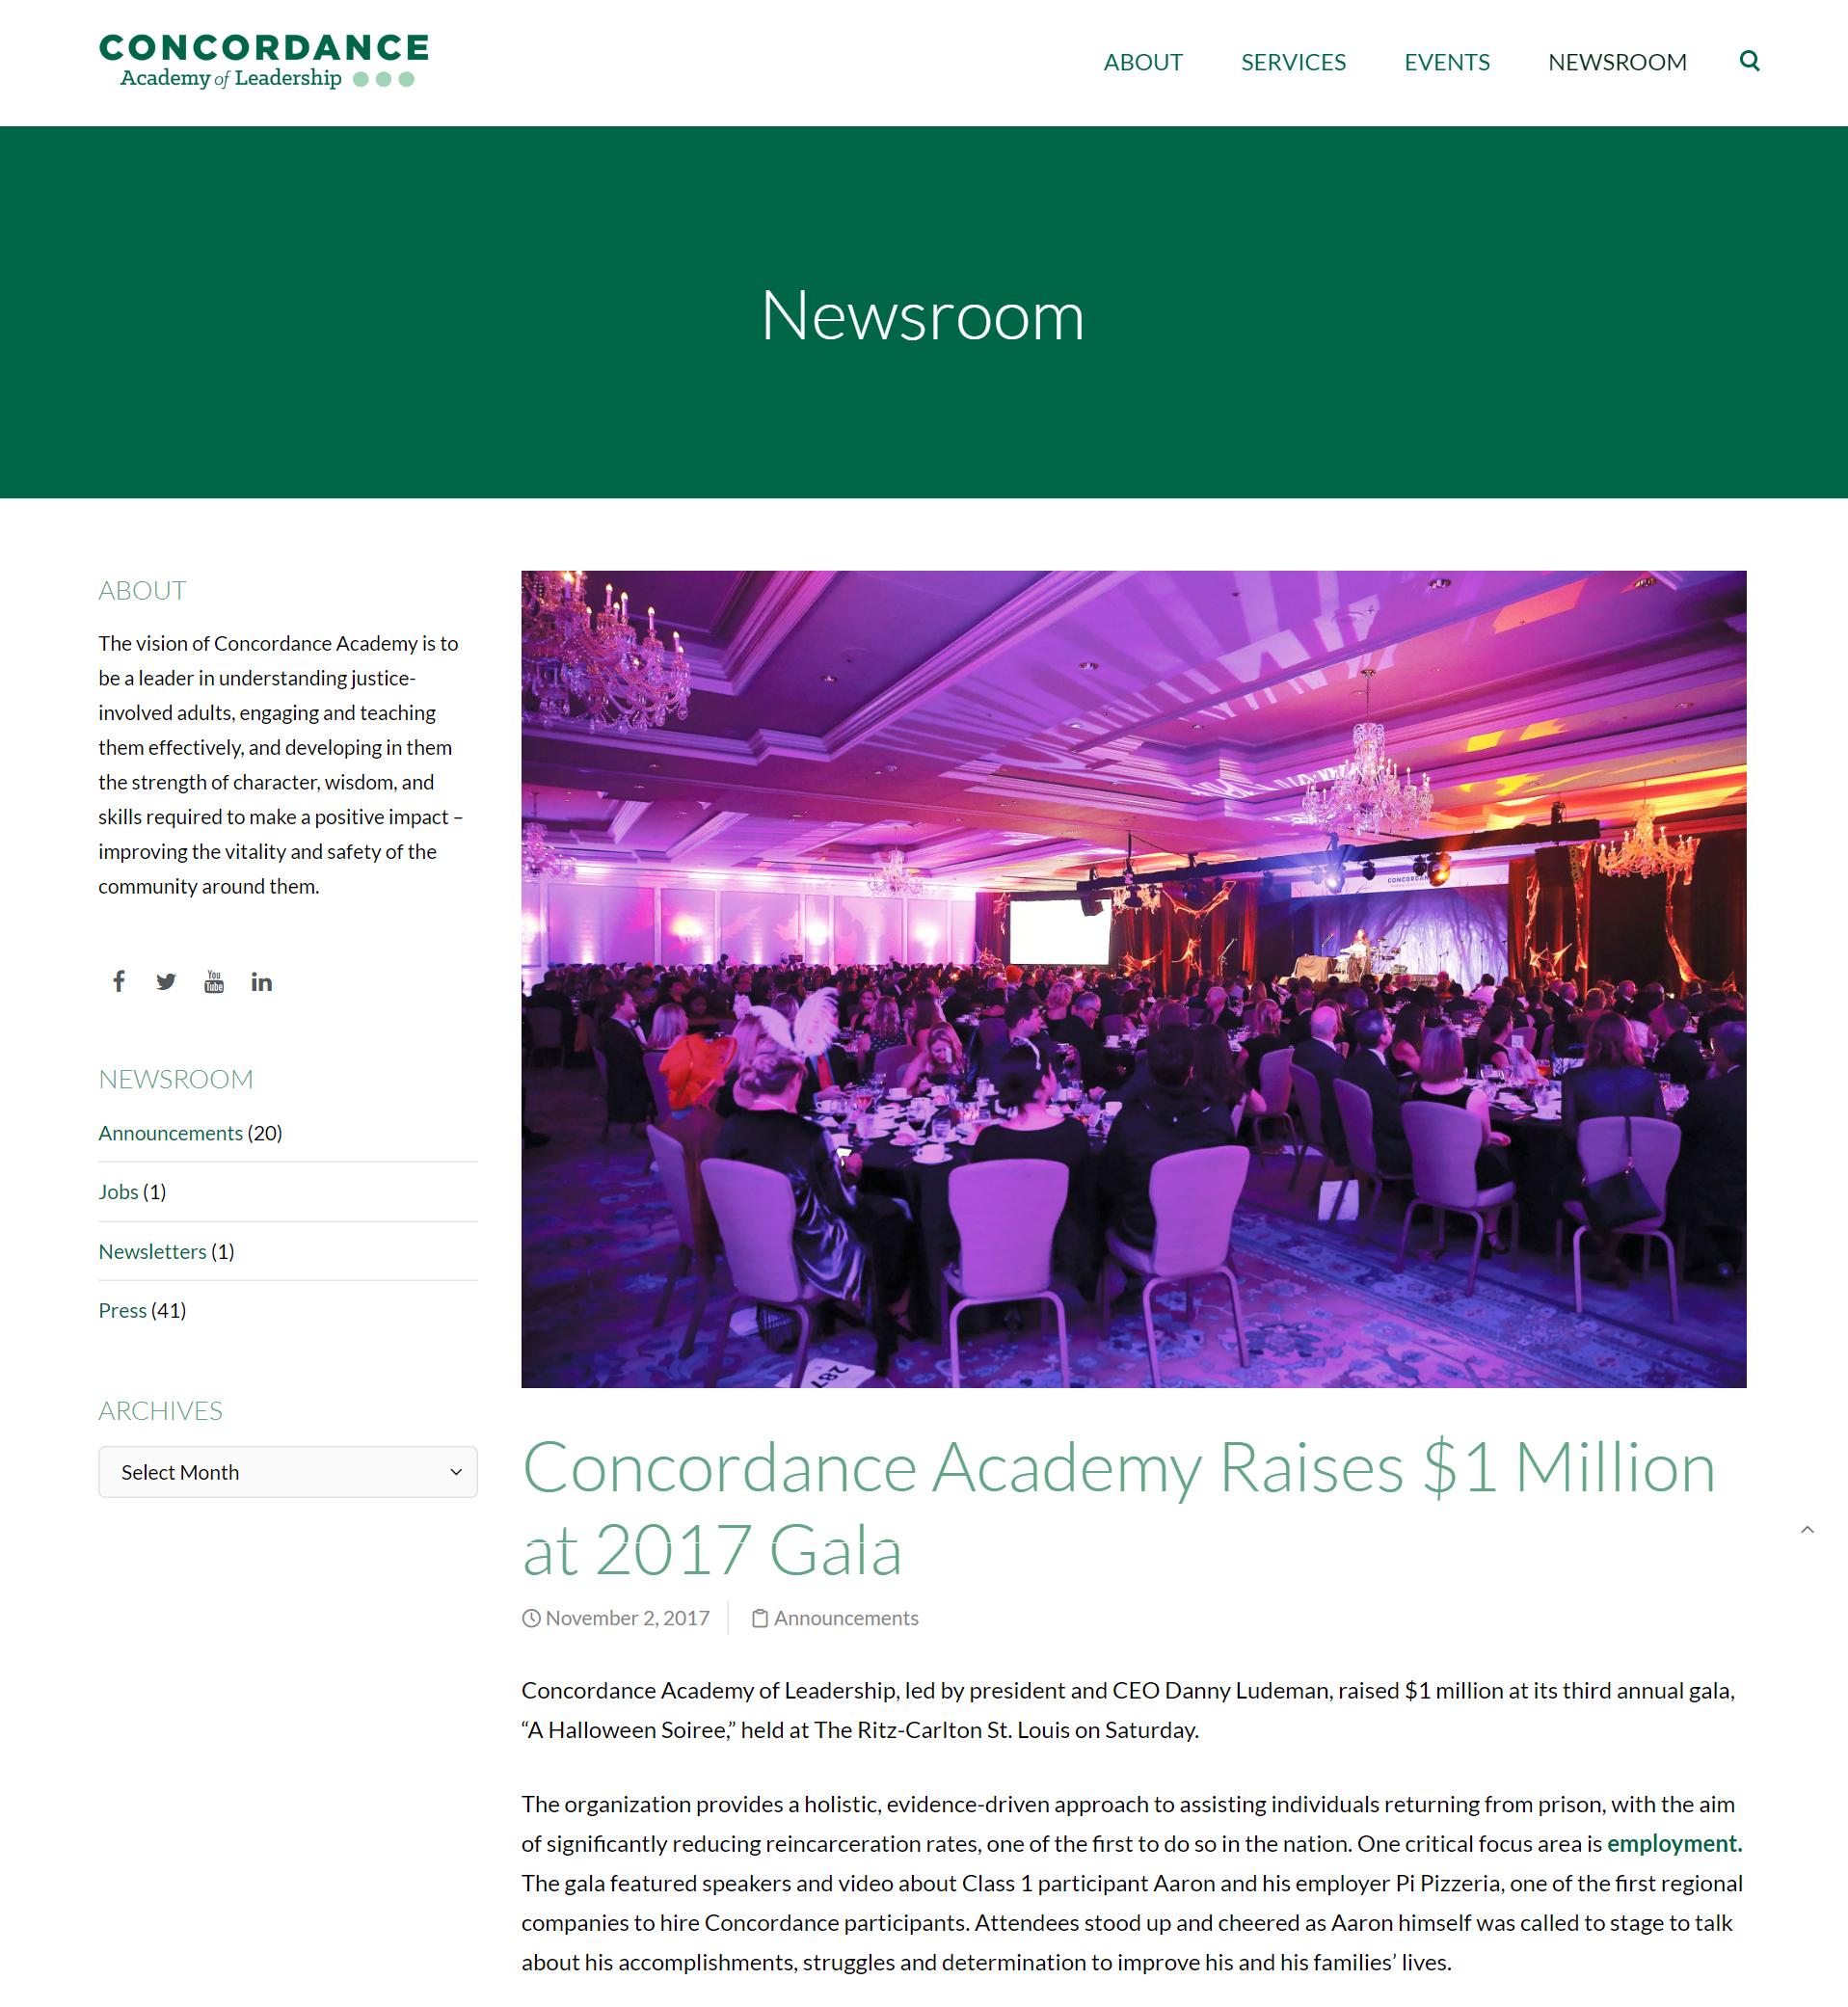 screencapture-concordanceacademy-org-2017-11-concordance-academy-raises-1-million-2017-gala-2018-05-22-23_42_5title0.png